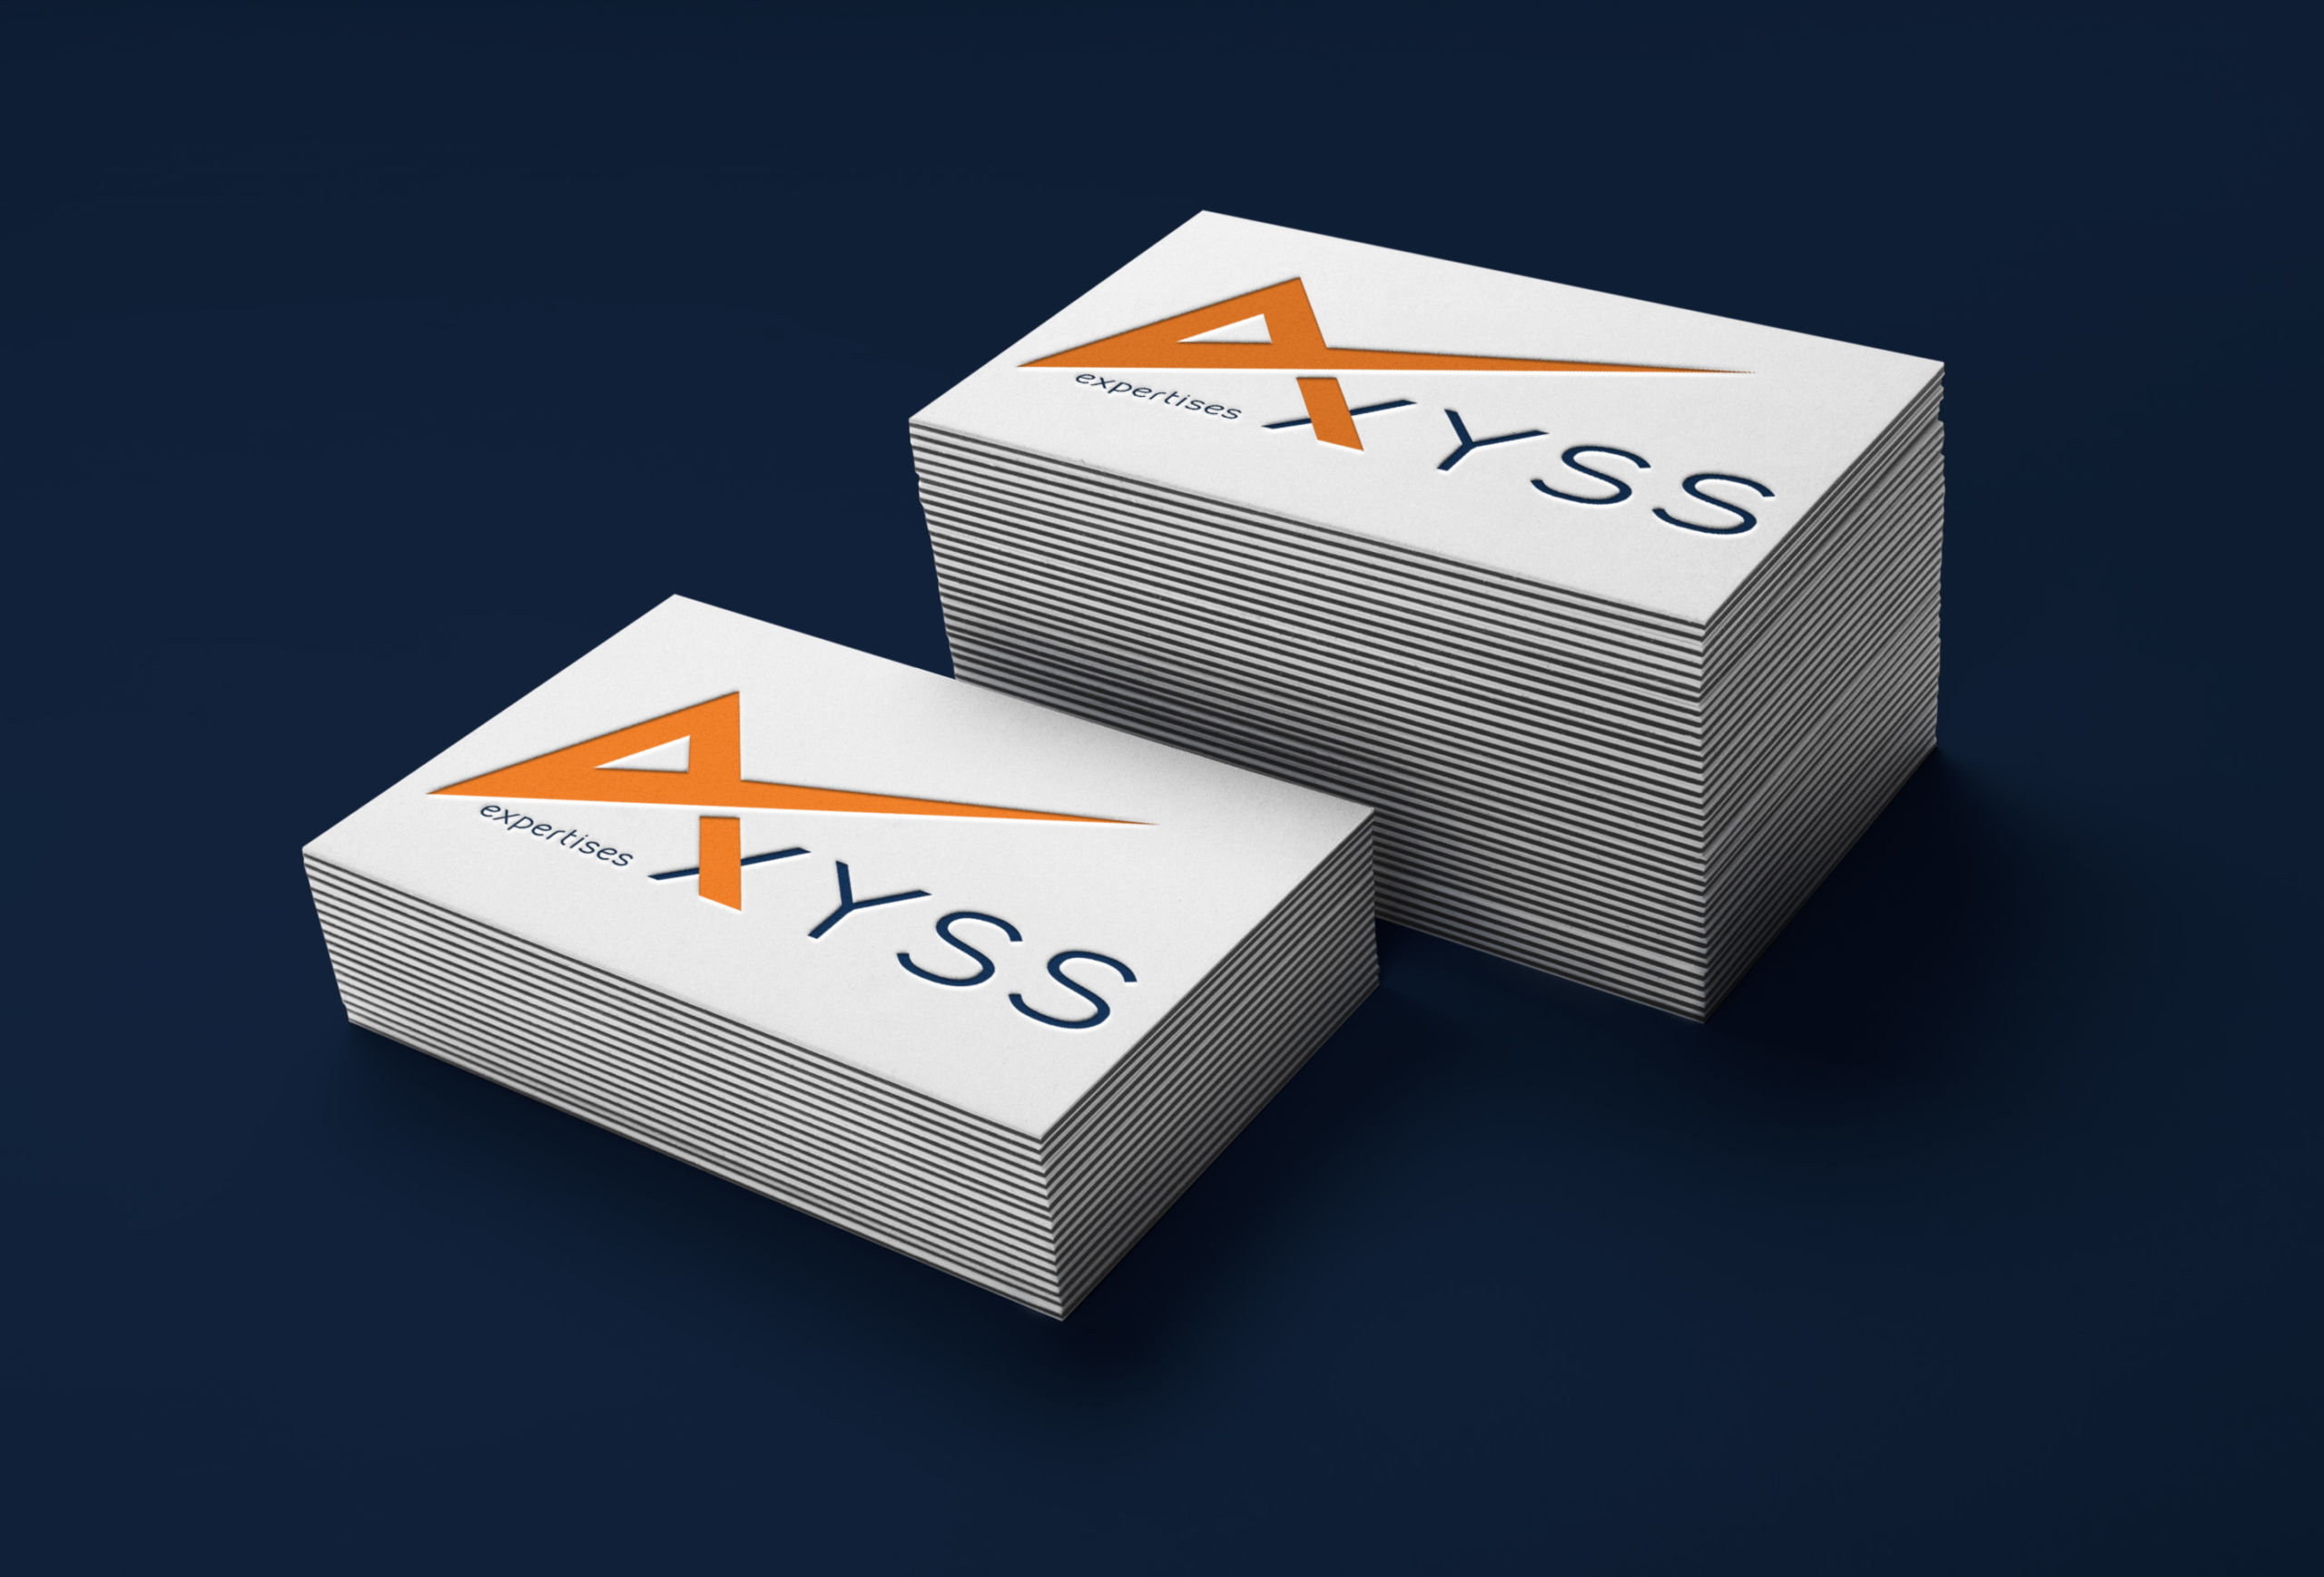 logo axyss